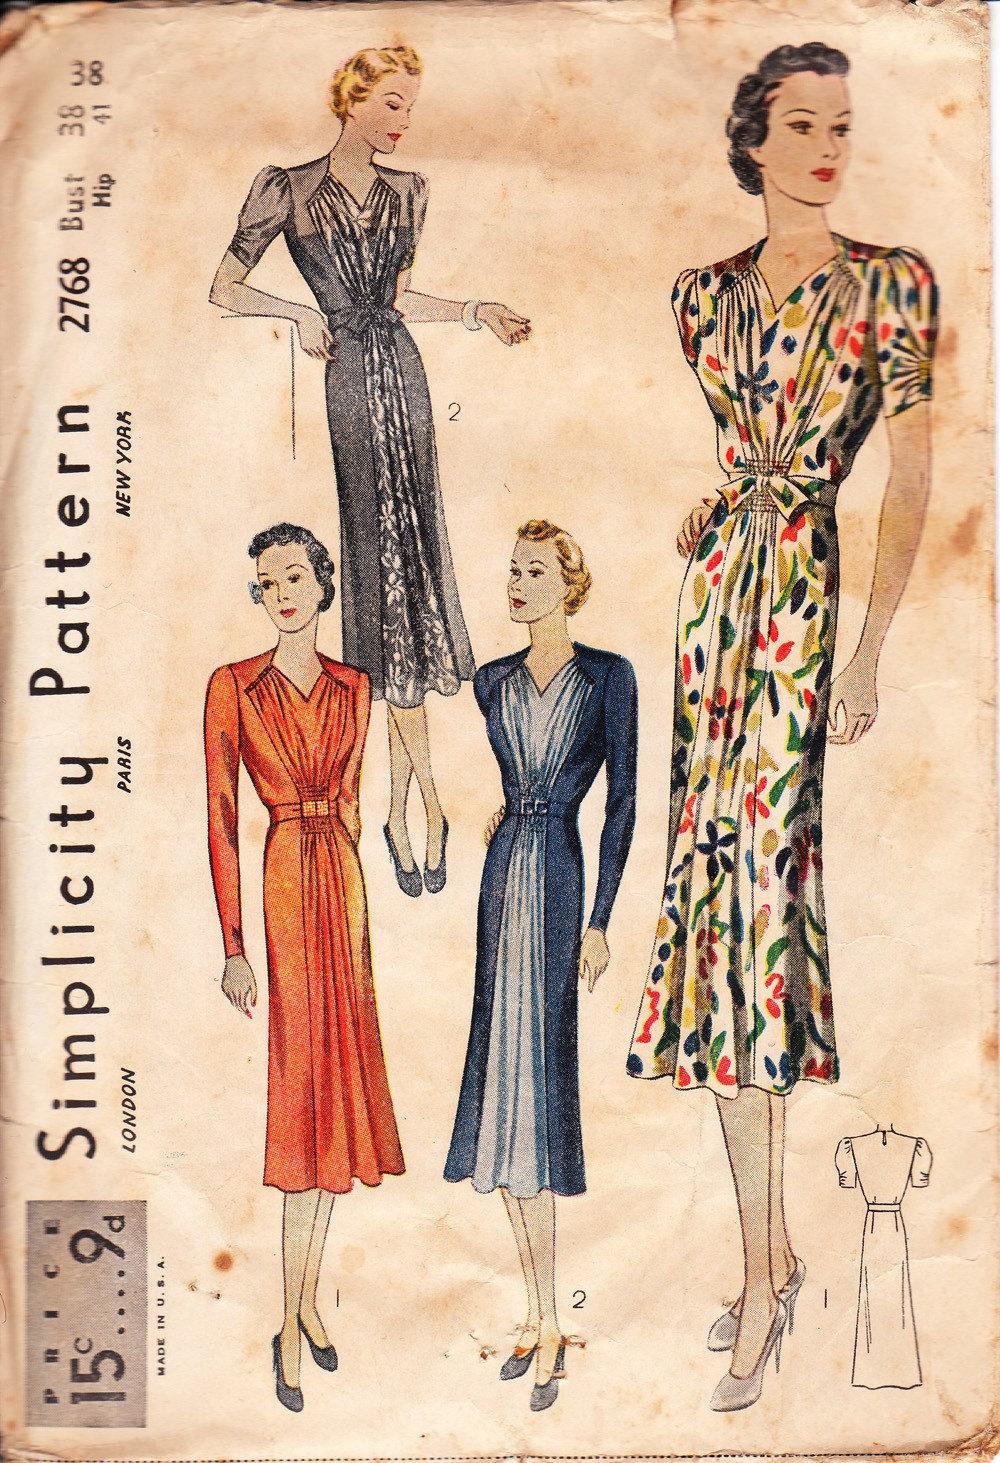 Vintage 1930s dress pattern Simplicity 2768